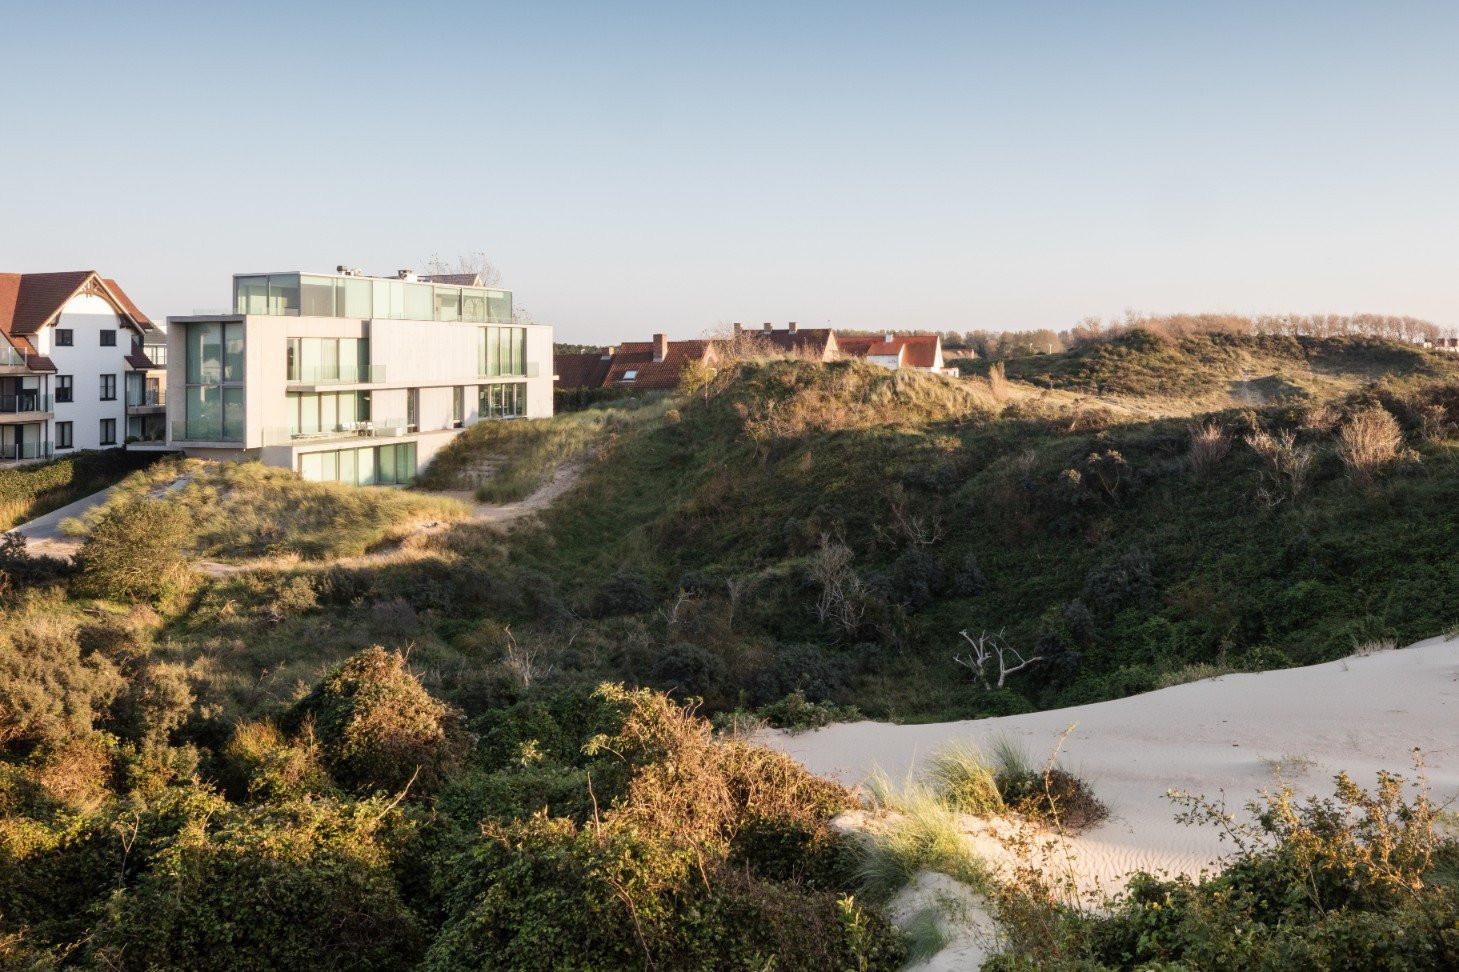 Rietveldprojects-saarinen-appartement-design-architectuur-kust-tvdv17_1459x0.jpg